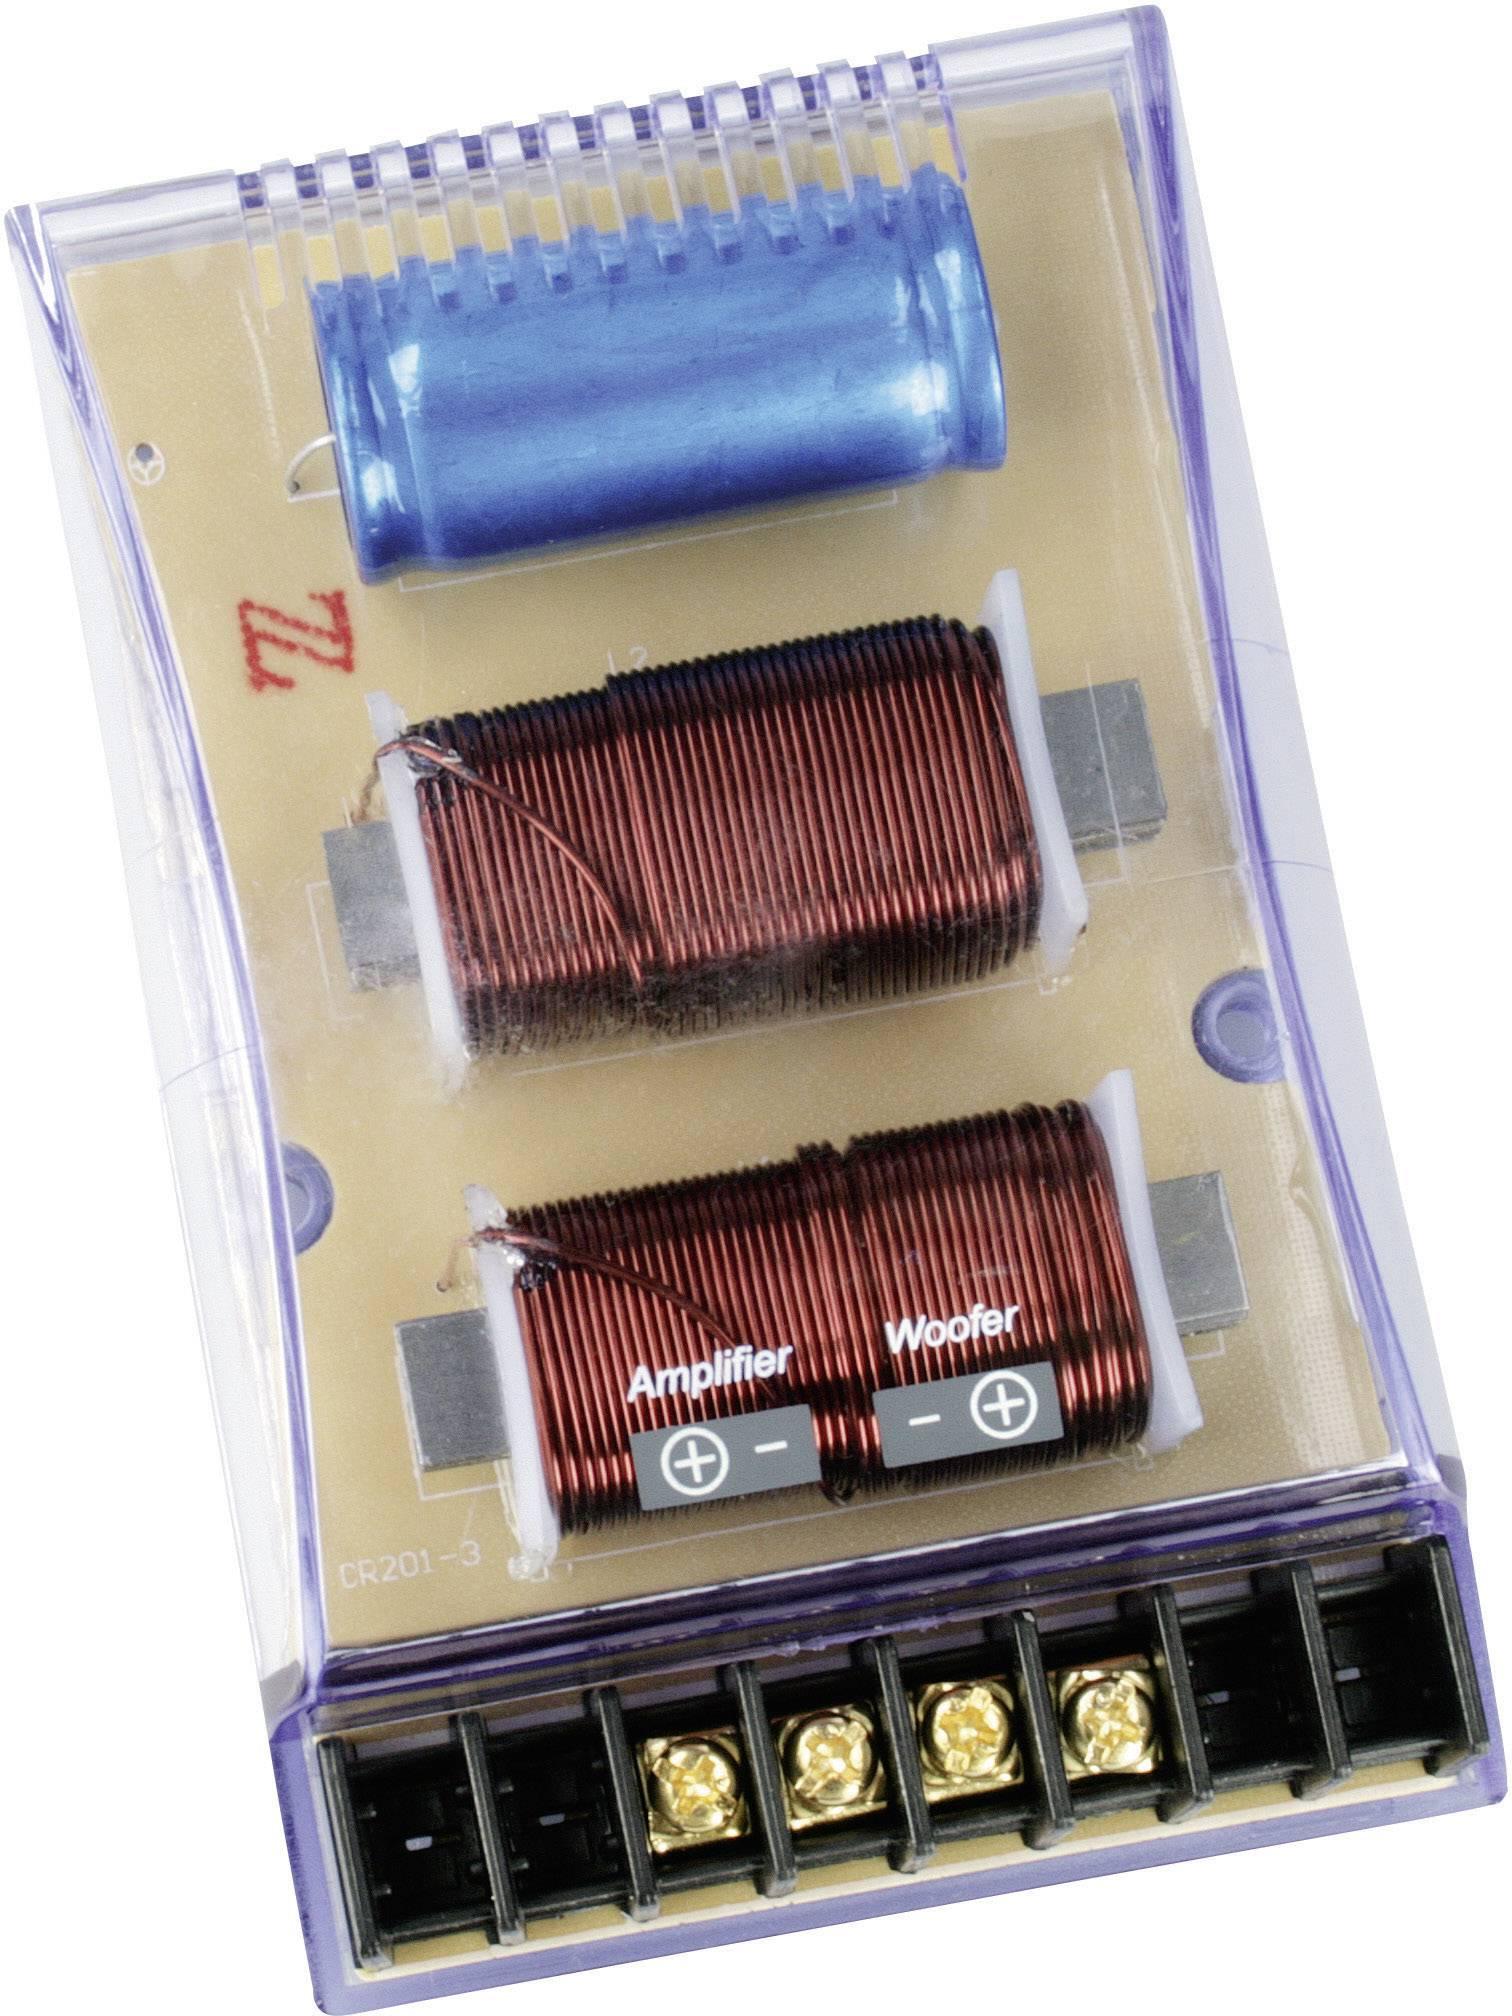 Anbaukit Mosfet FH020AA,SH775 auf Suzuki GSXR1000 K5 K6 K7 K8 K9 L0